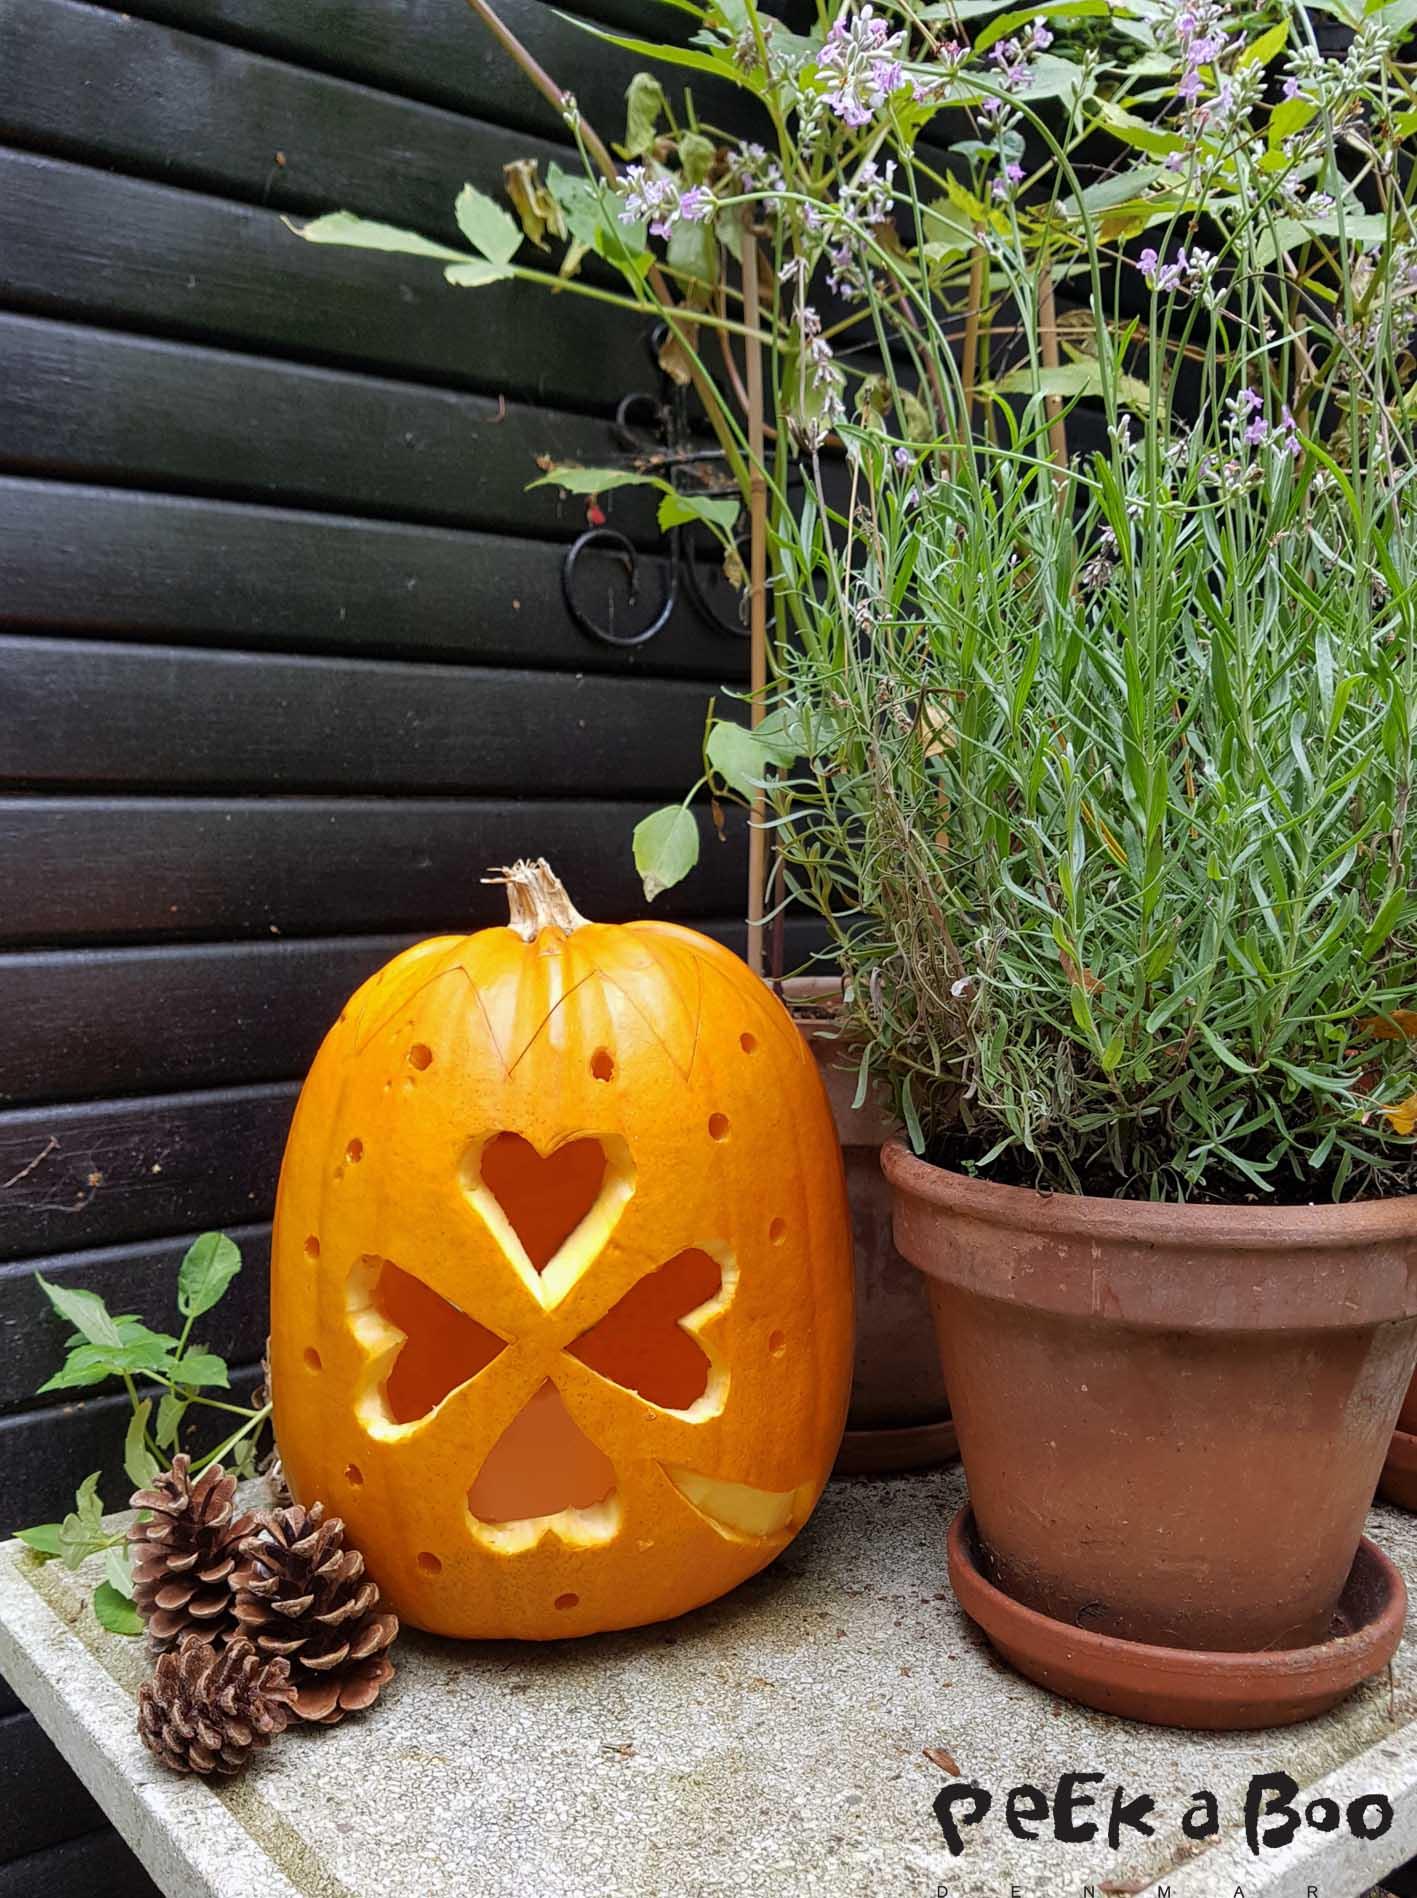 Pumpkin lantern with four-leaf clover pattern.